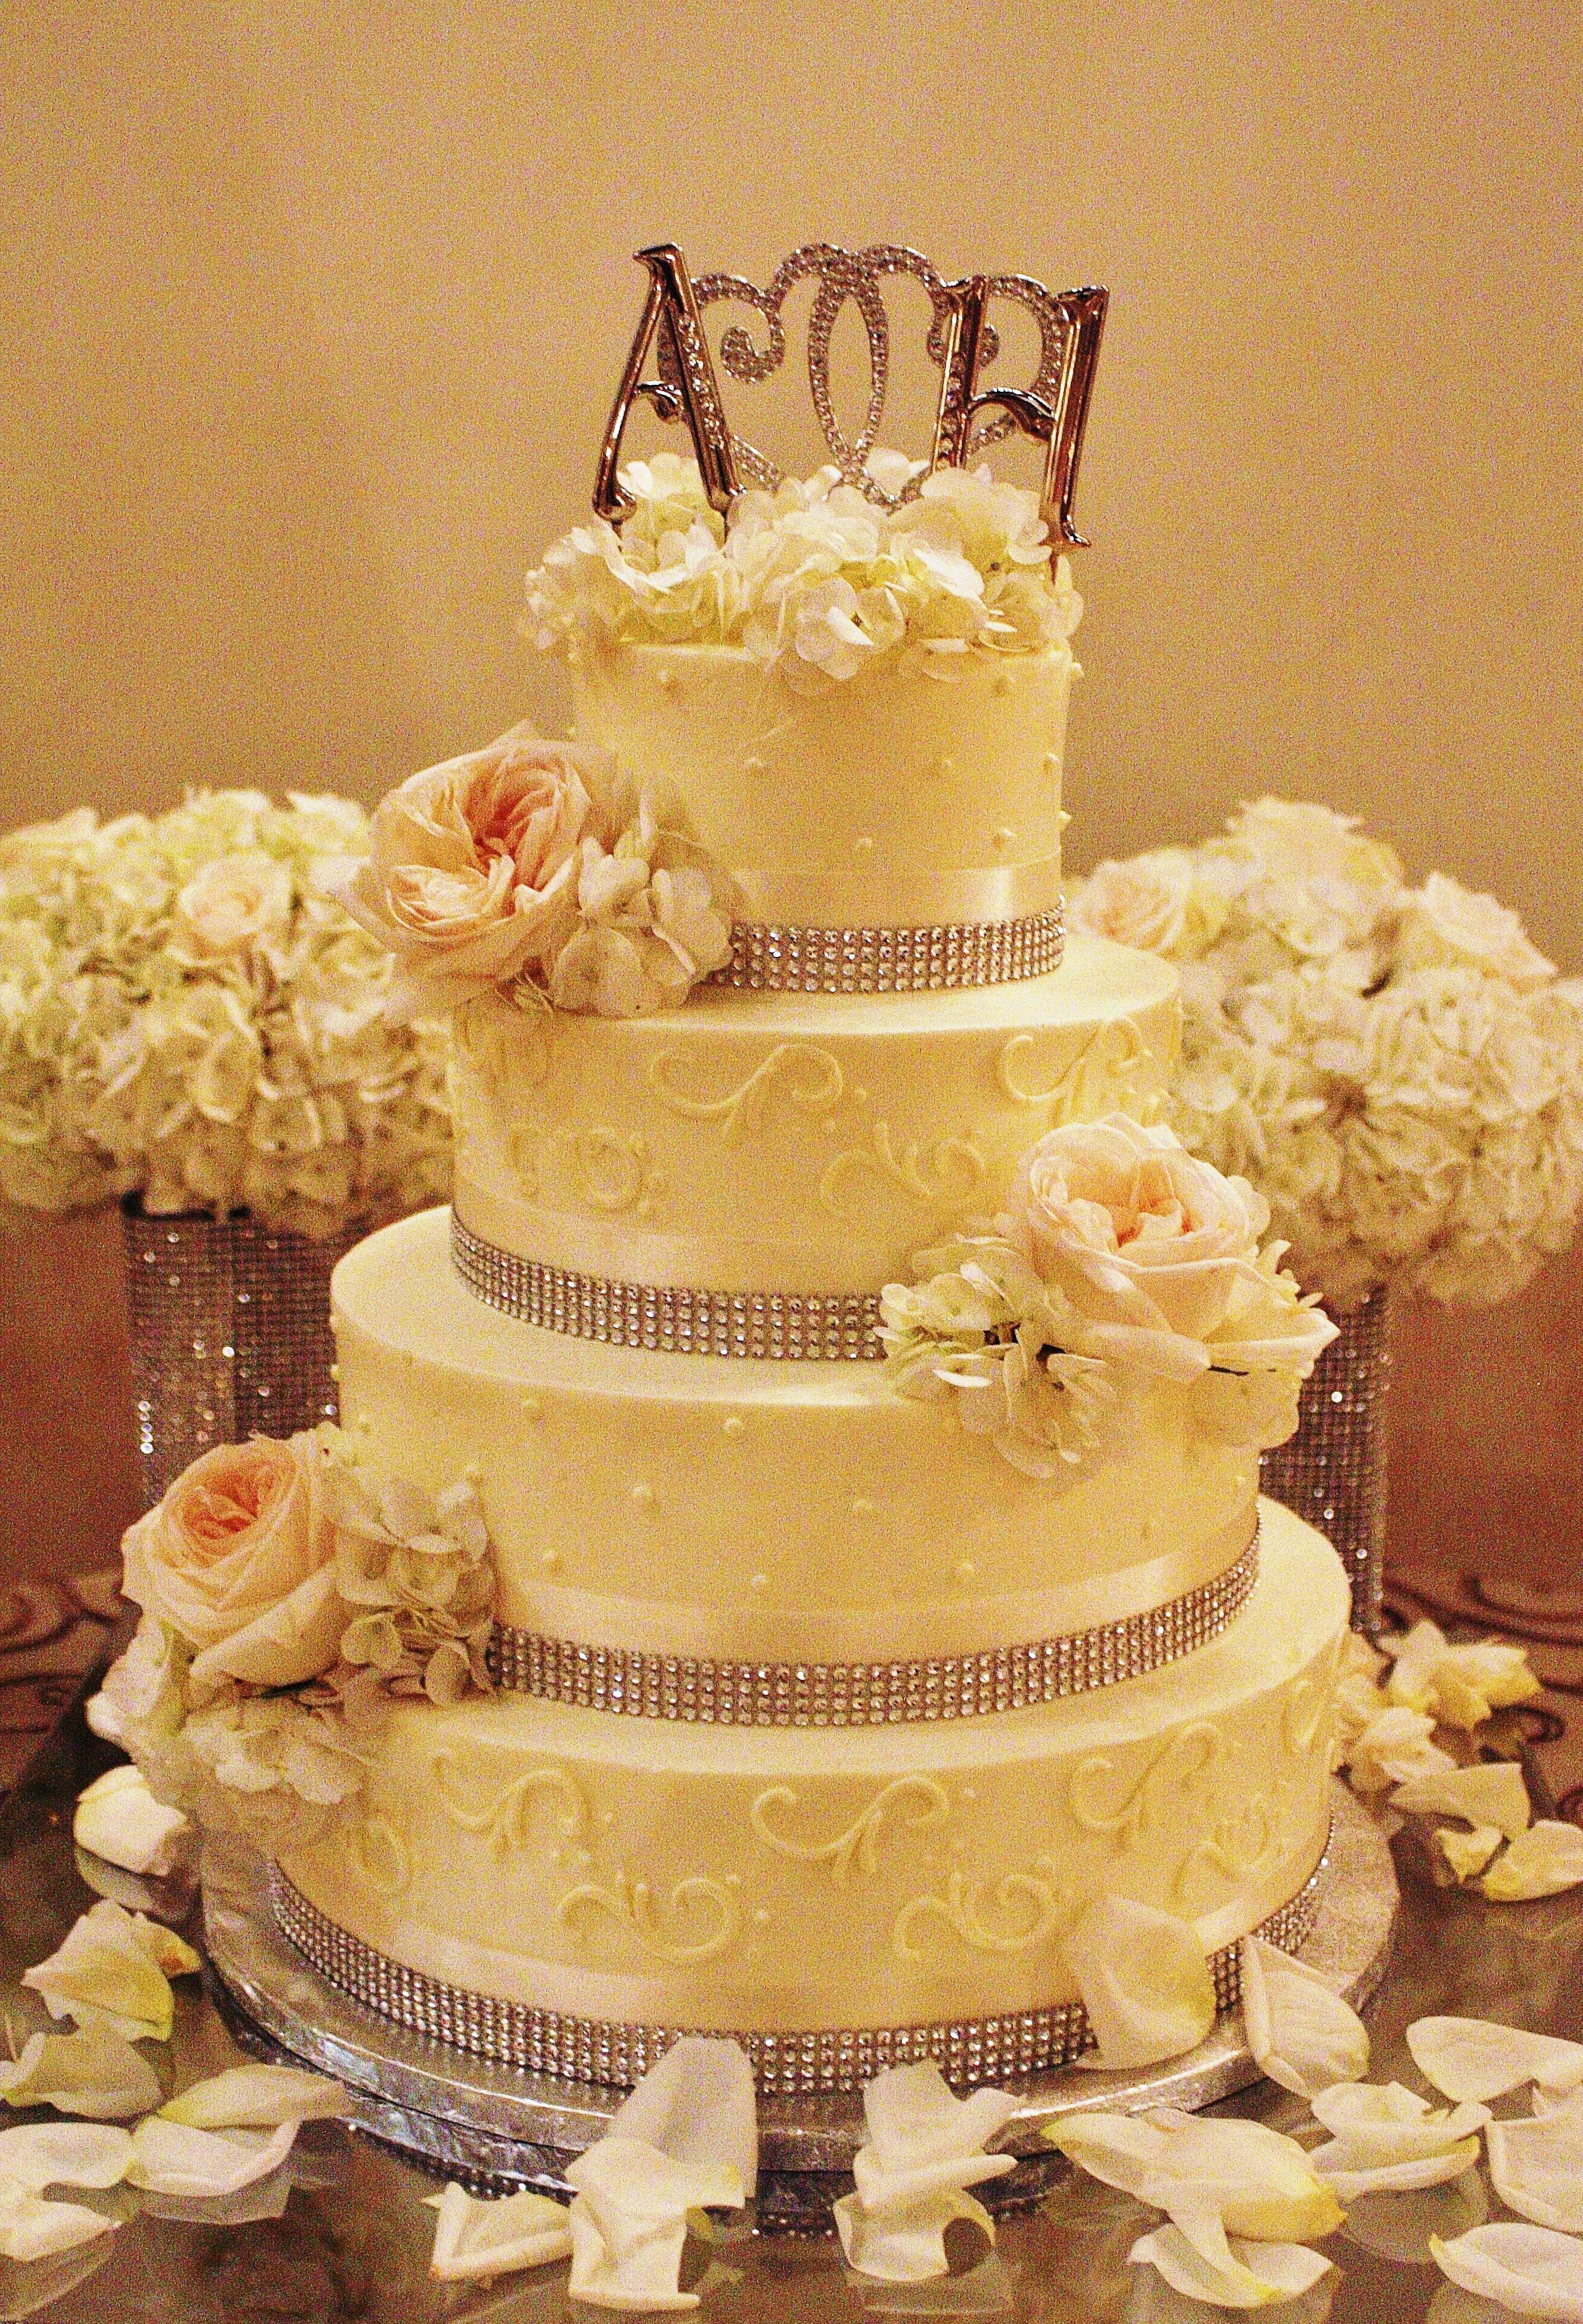 Pelazzio Full Service Wedding Venue can handle your cakes